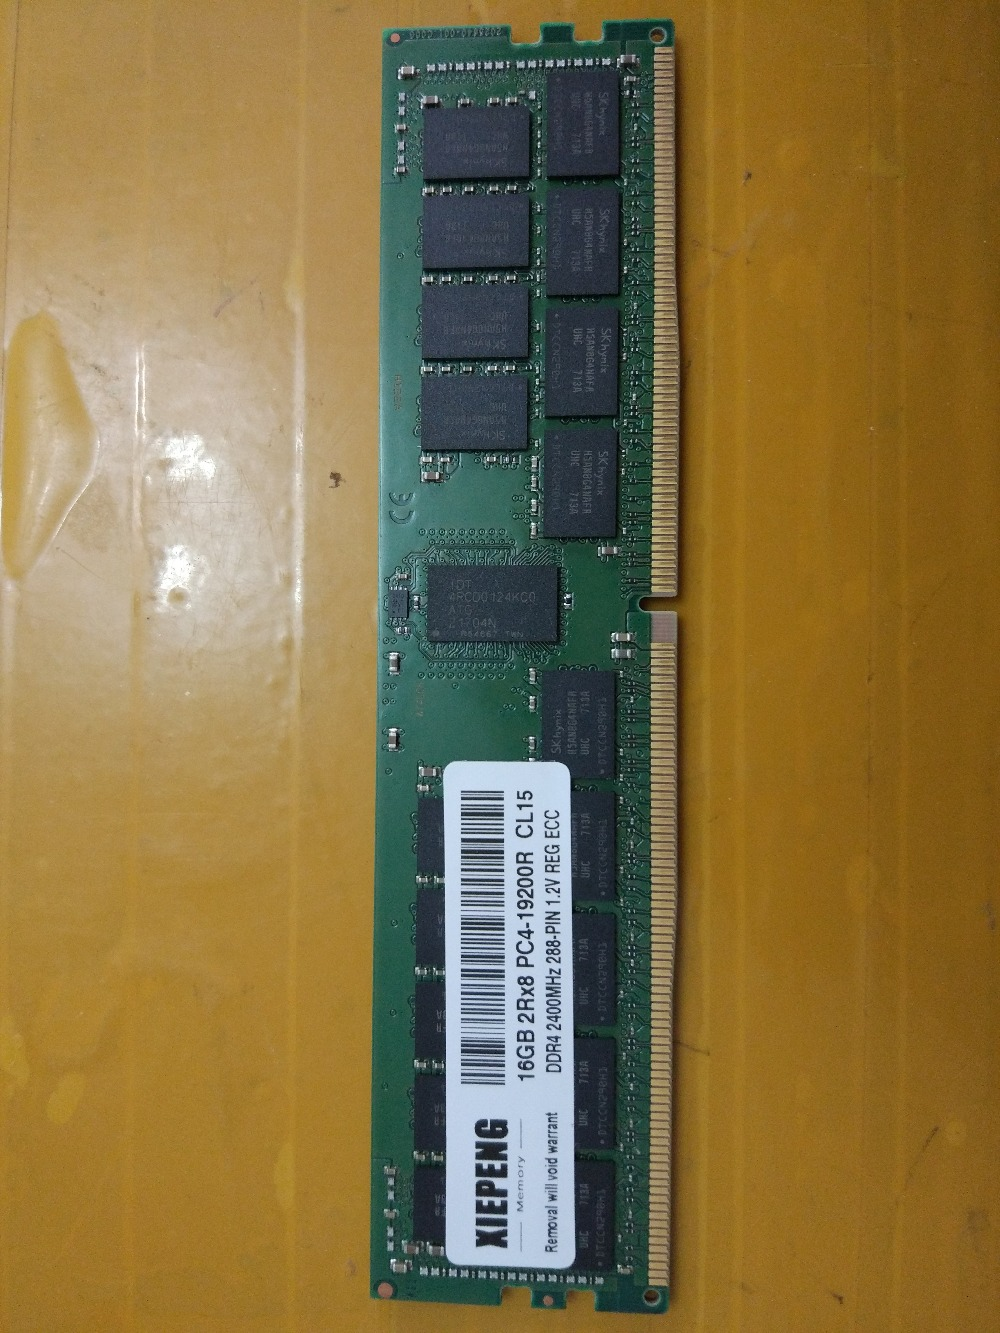 Texnite 713985-S21 2 x 16GB G8 G8 WS460c SL4540 Dual Rank x4 PC3L-12800R Registered CAS-11 Low Voltage Memory Kit for HP Proliant DL360p G8 DL 580 DDR3-1600 32GB G8 G8 SL270s